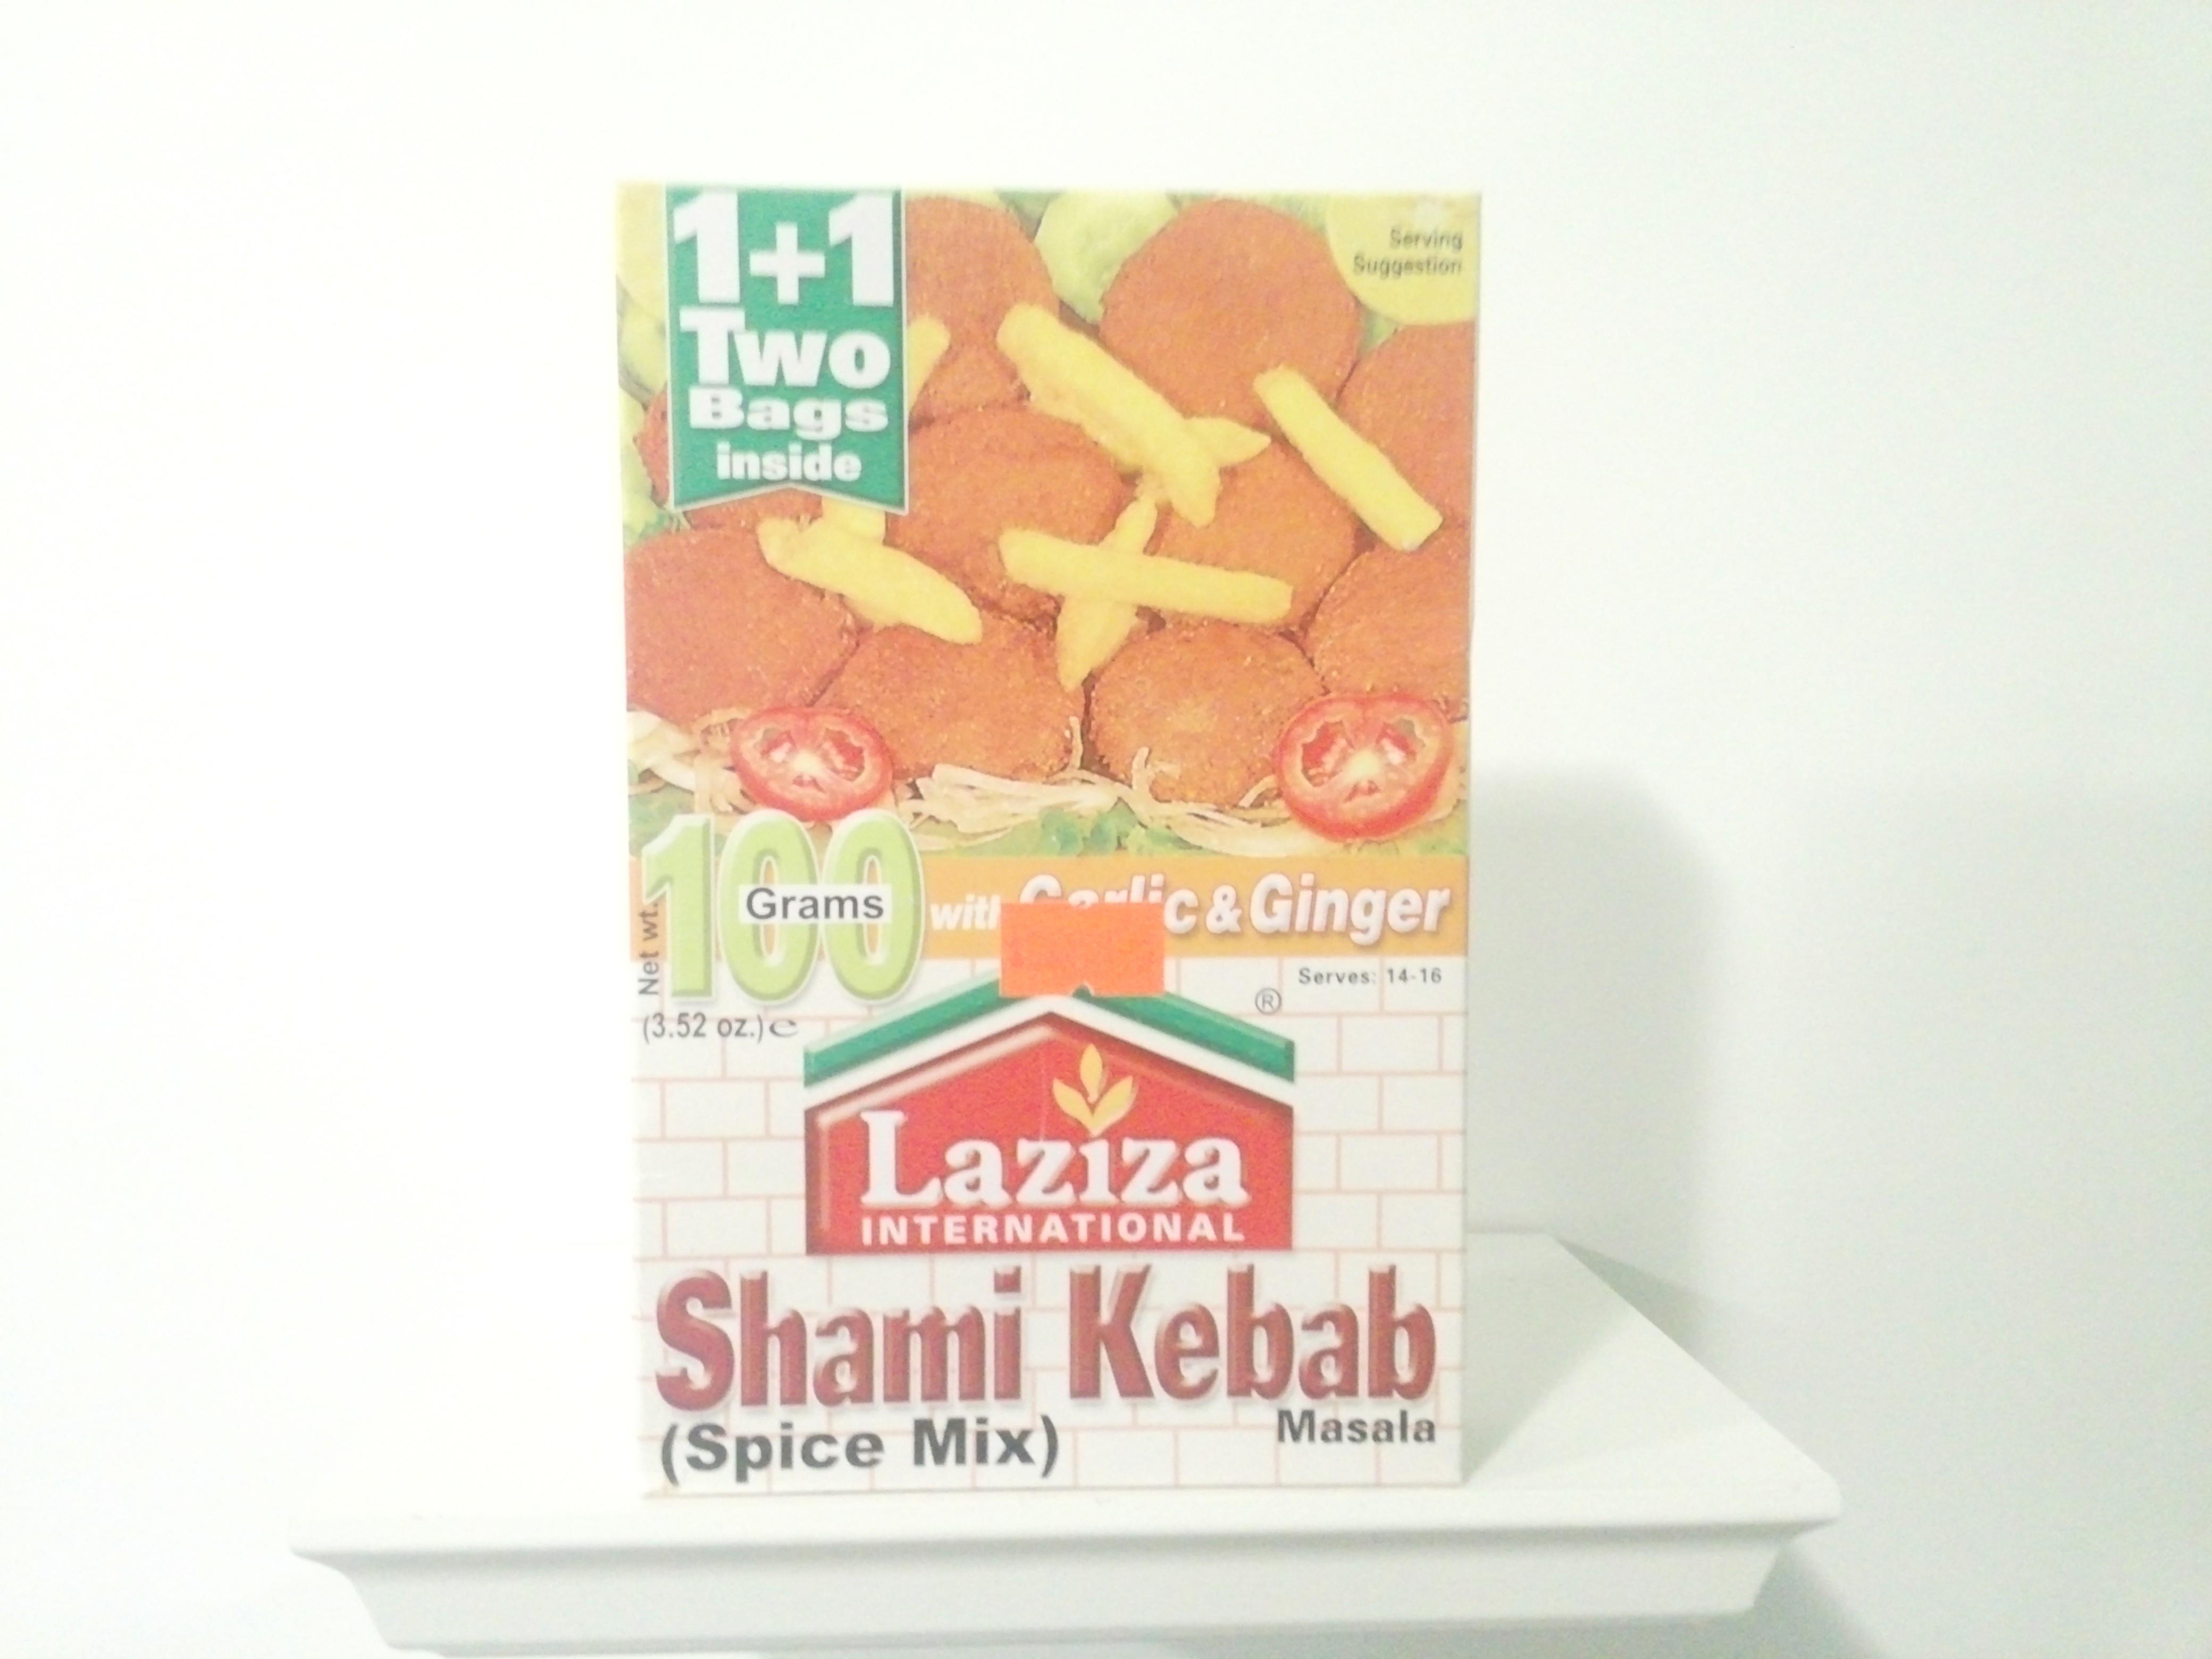 Laziza Shami Kebab Spice Mix 100 grm